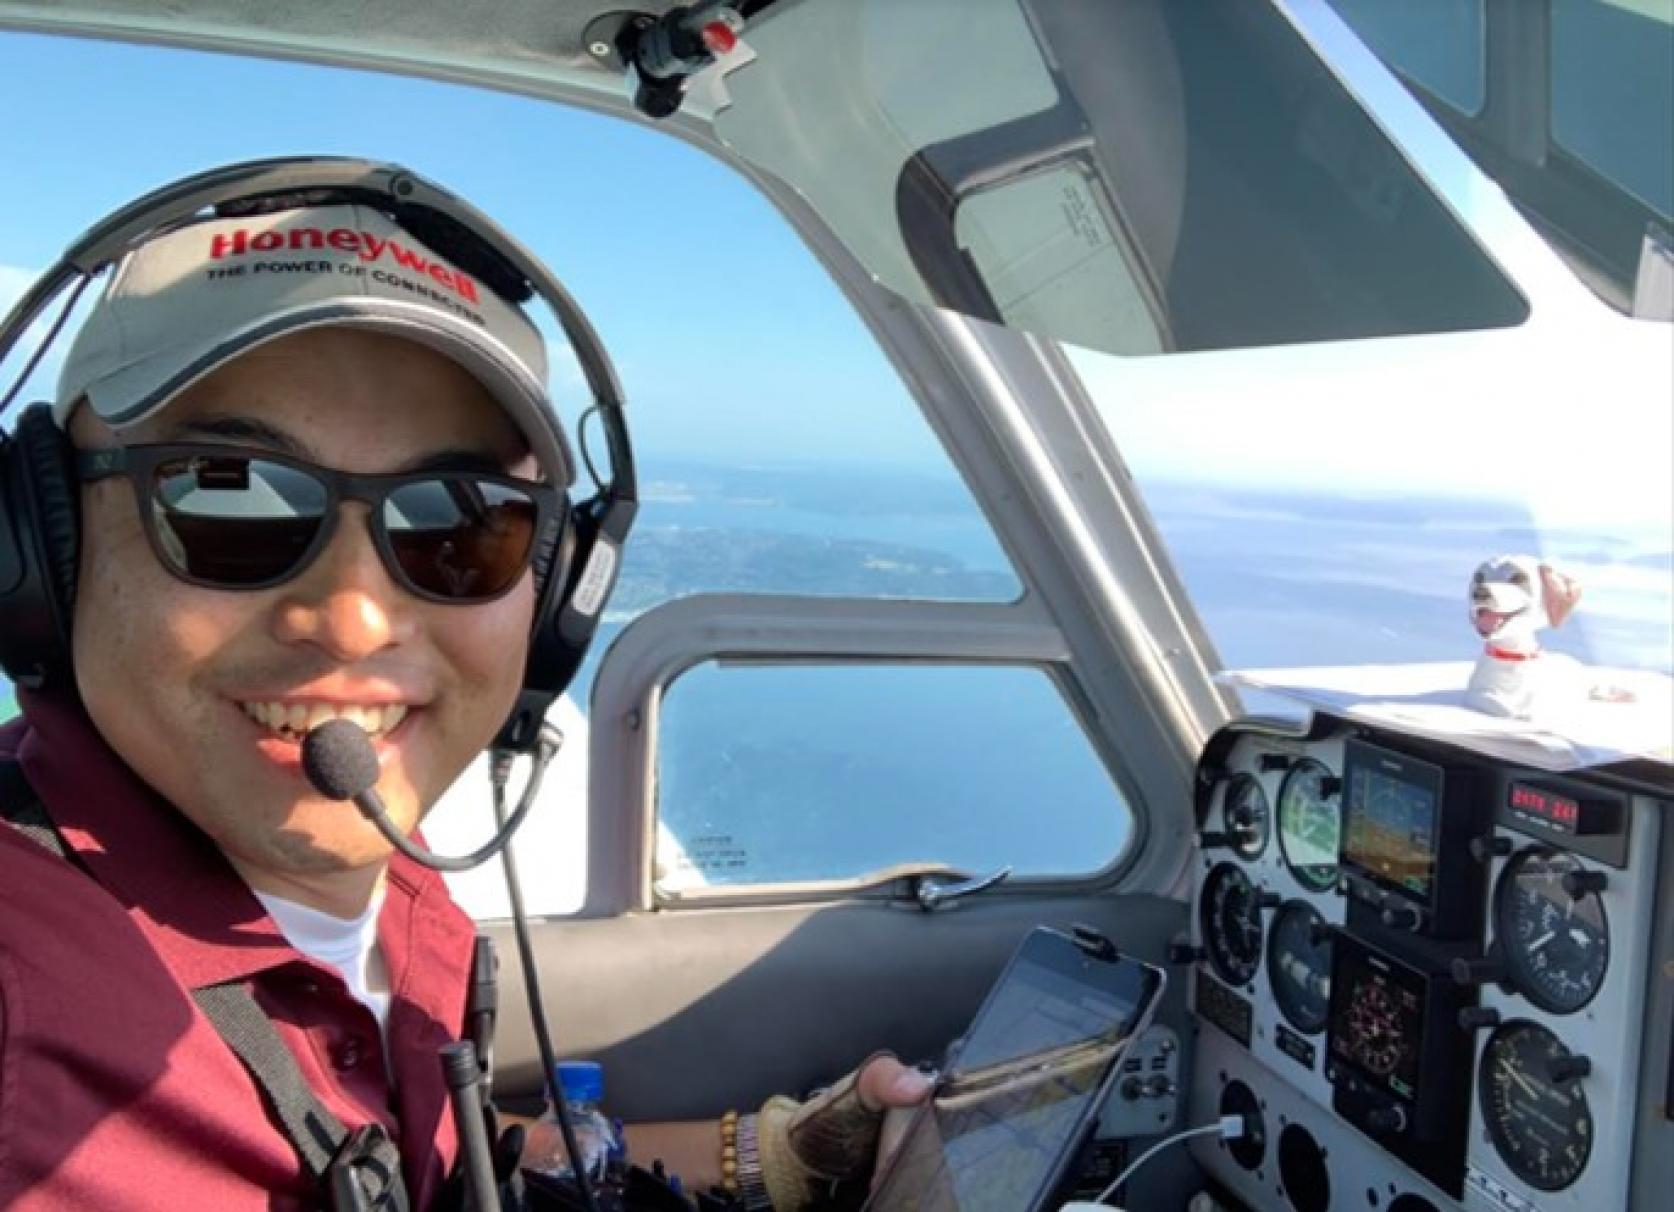 Aero Zypangu Project航空宇宙工学科OB隻眼のパイロット前田伸二さん、単独世界一周飛行「EARTHROUNDER MISSION」いよいよ5月1日Take Off!